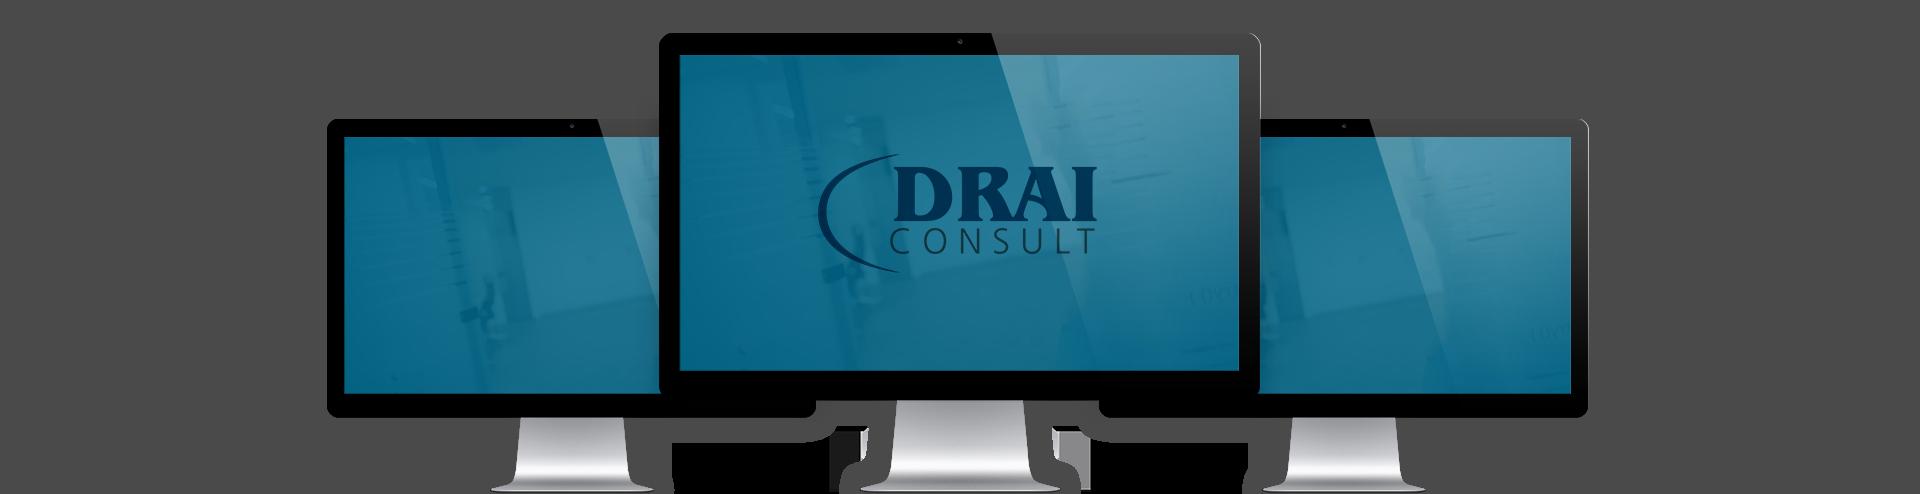 SliderOverlay_DRAI Consult